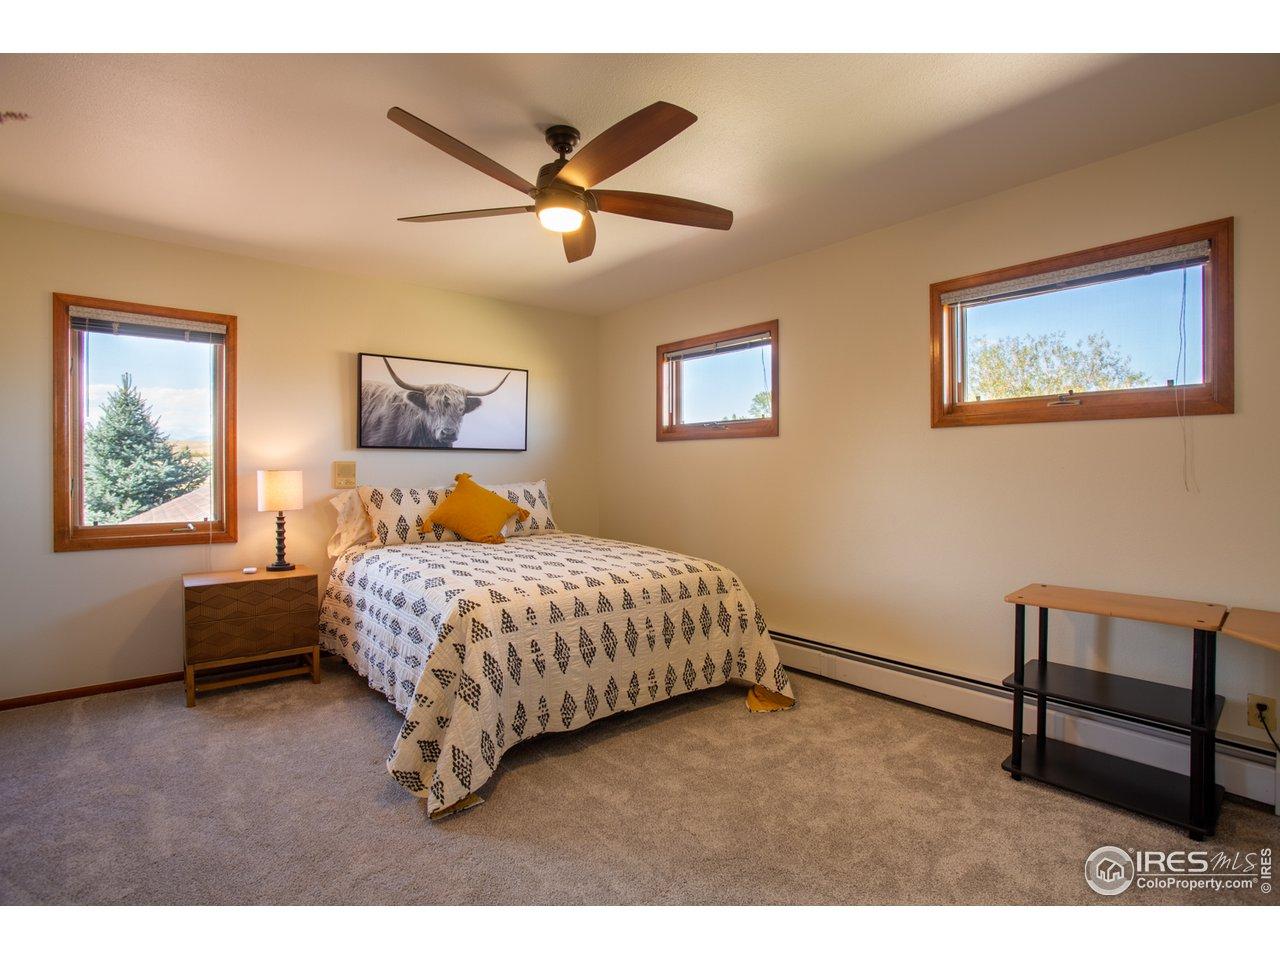 basement study/office/flex room